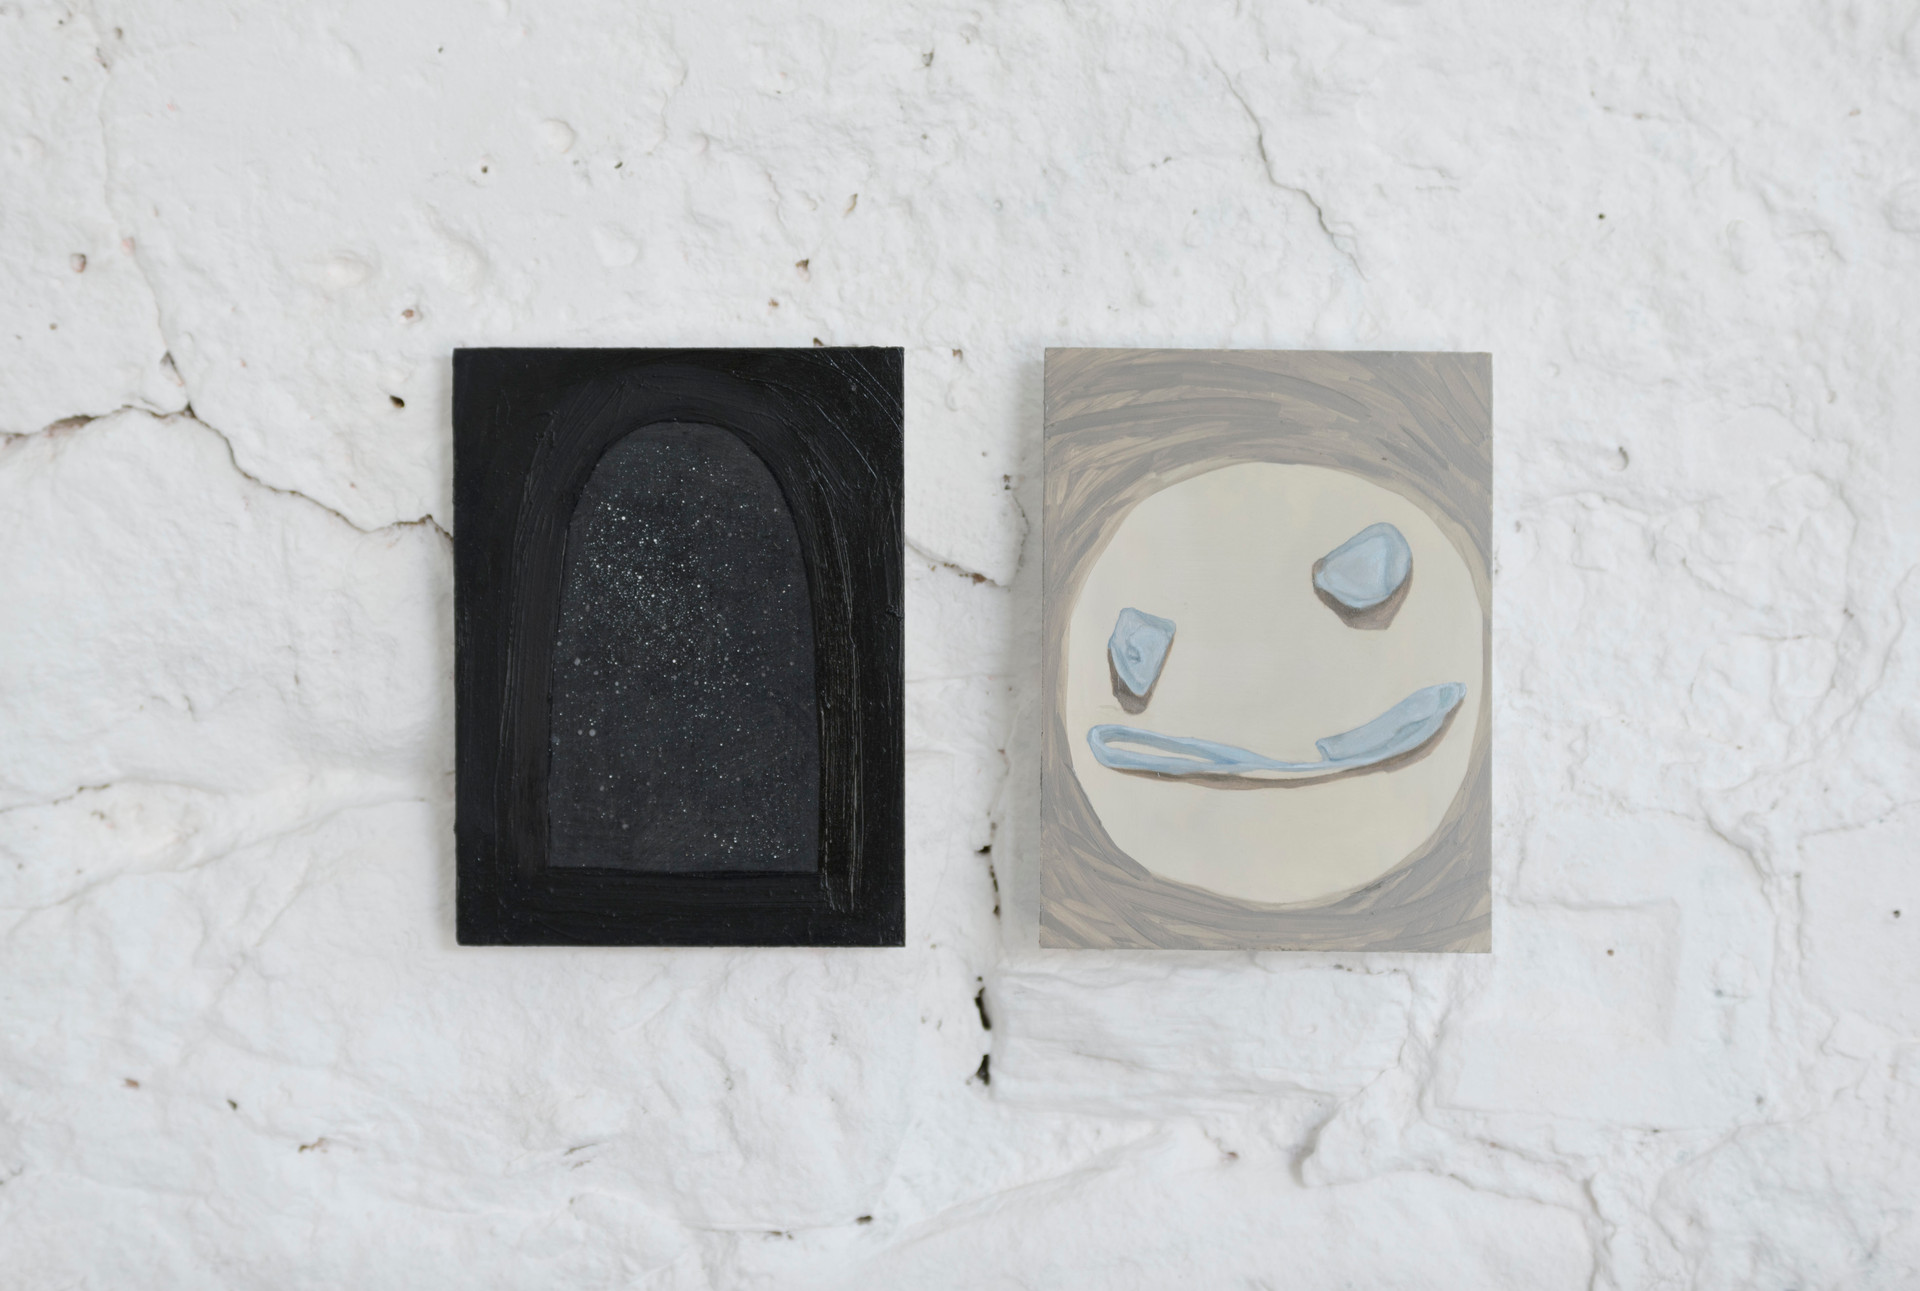 smiley contemplates the universe, 2017, oil on board, 20 x 15cm each